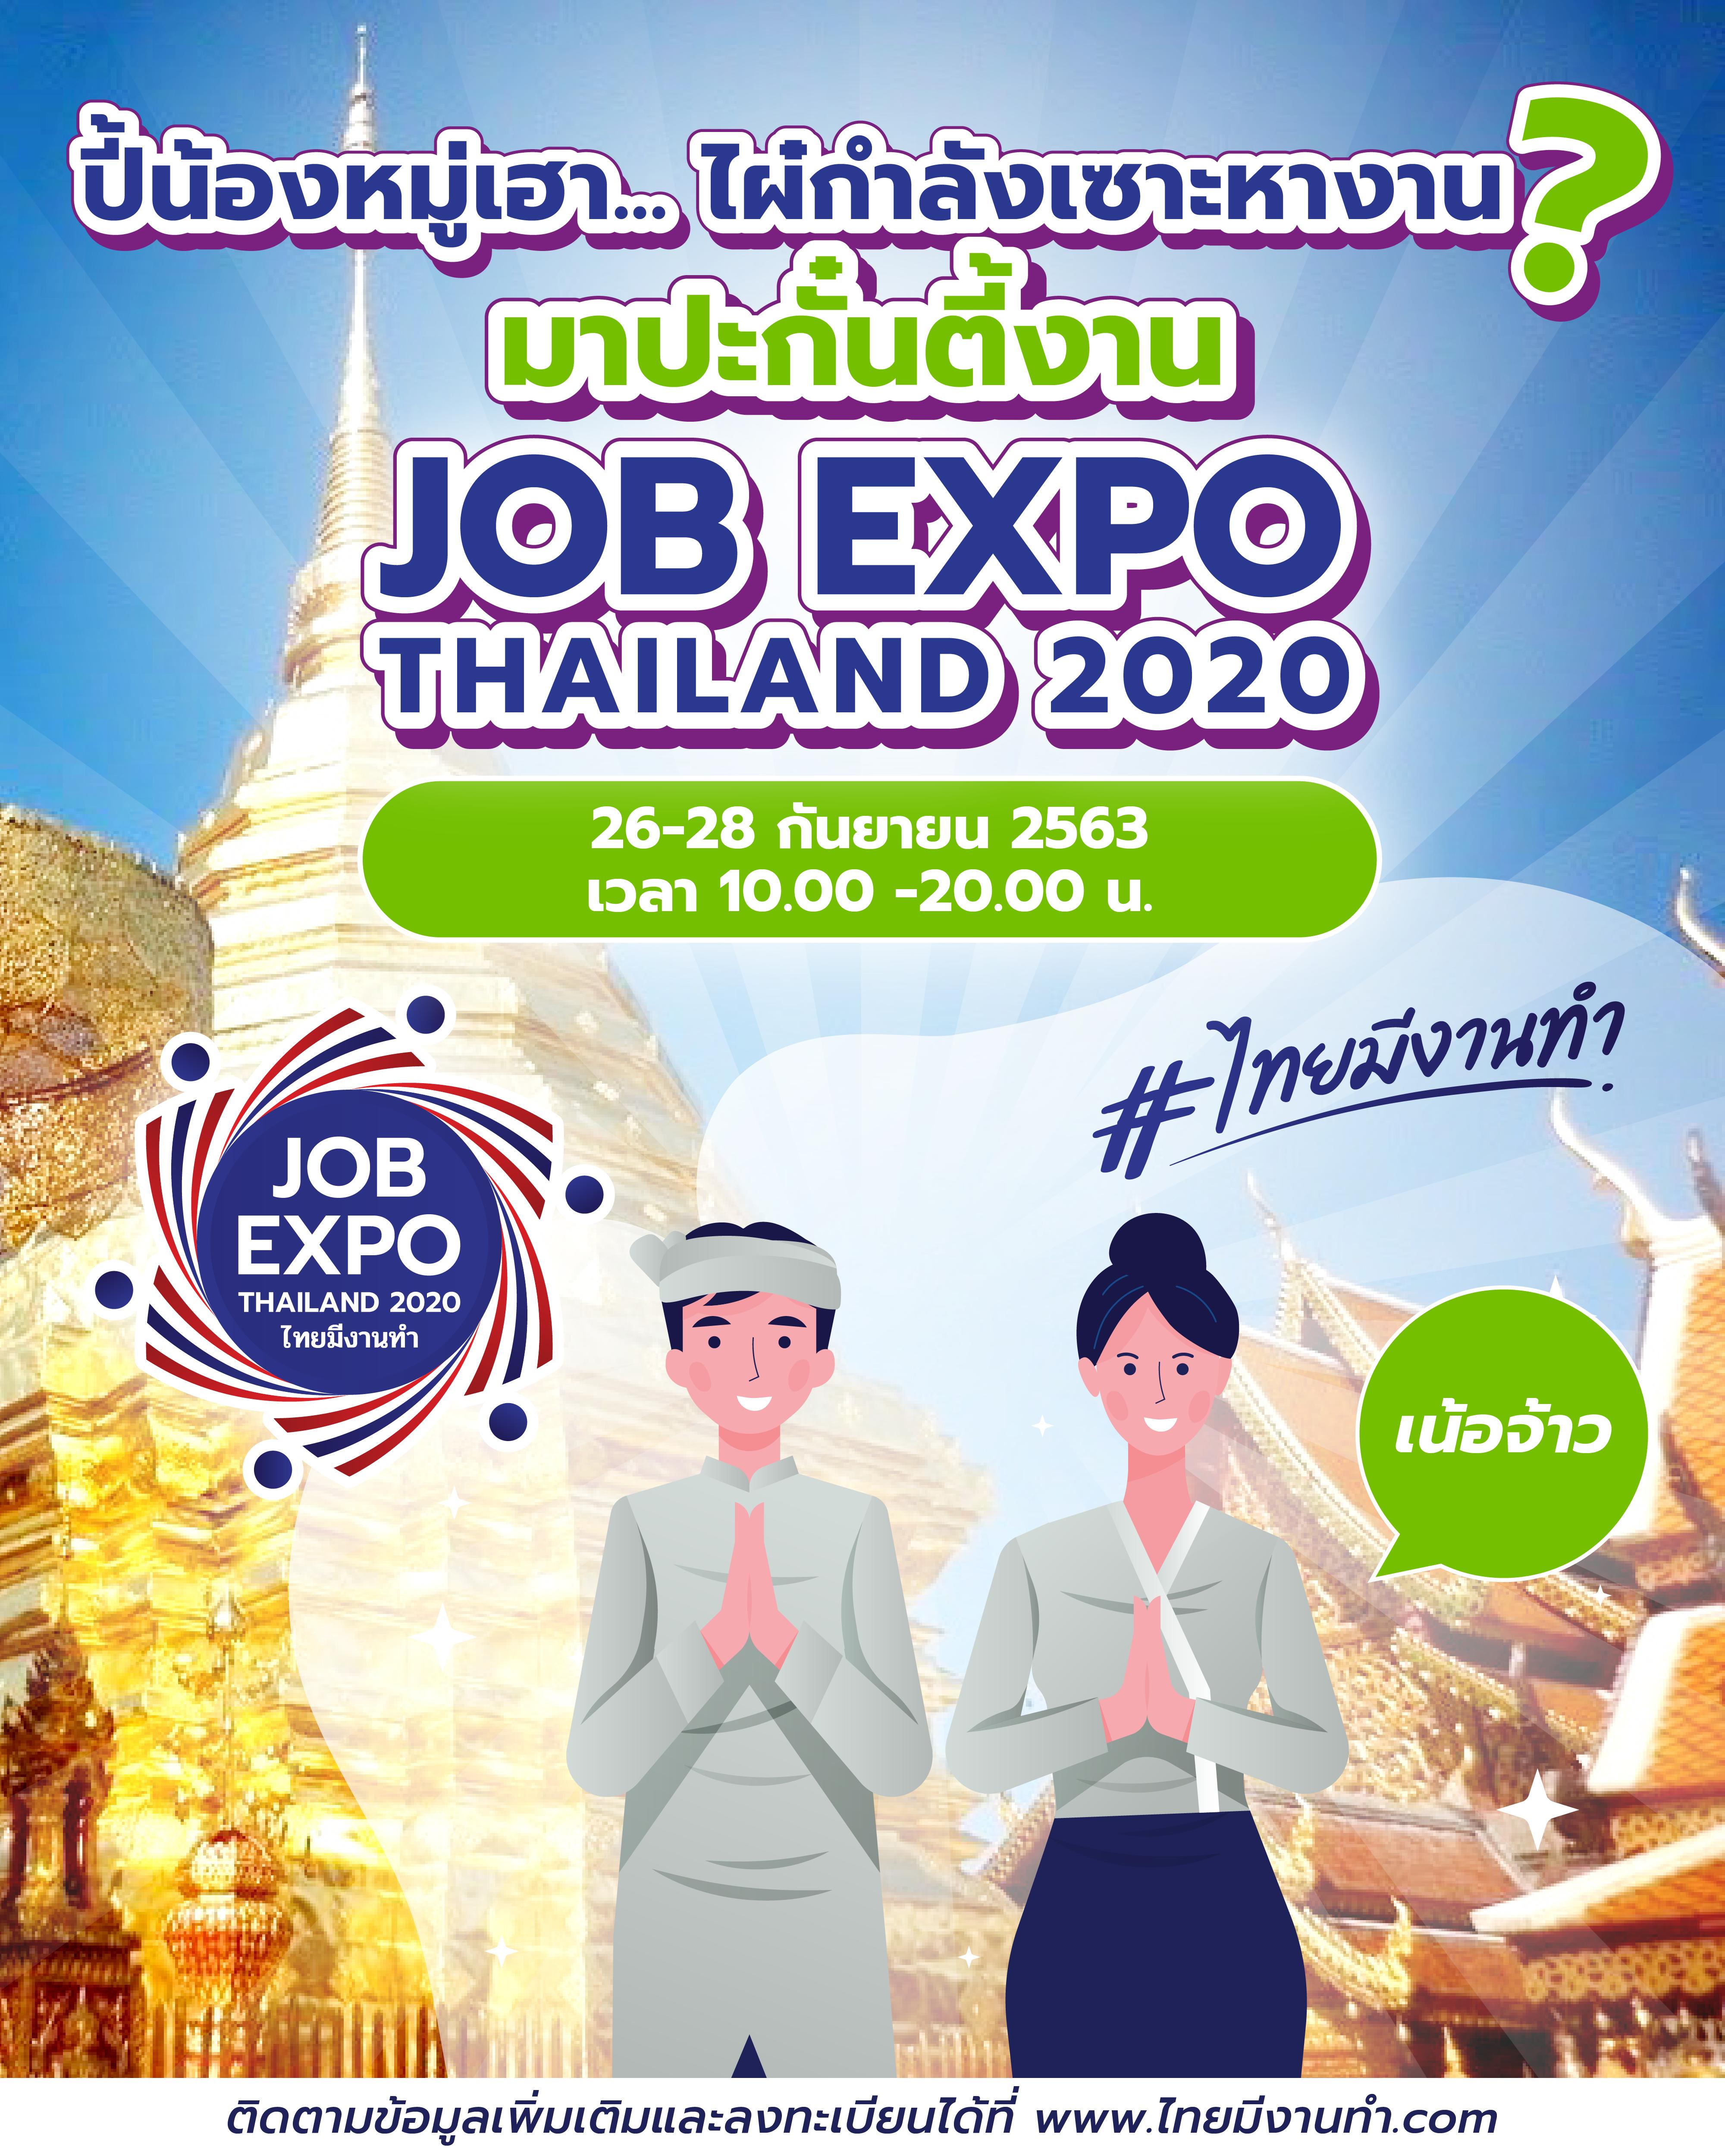 "JOB EXPO THAILAND2020 คนไทยมีงานทำ 26-28 กันยายน 2563 ณ ไบเทคบางนา หรือลงทะเบียนหางานได้ที่ เว็บไซต์ ""ไทยมีงานทำ.com"" มีตำแหน่งงานมากกว่า 1,000,000 อัตรา"